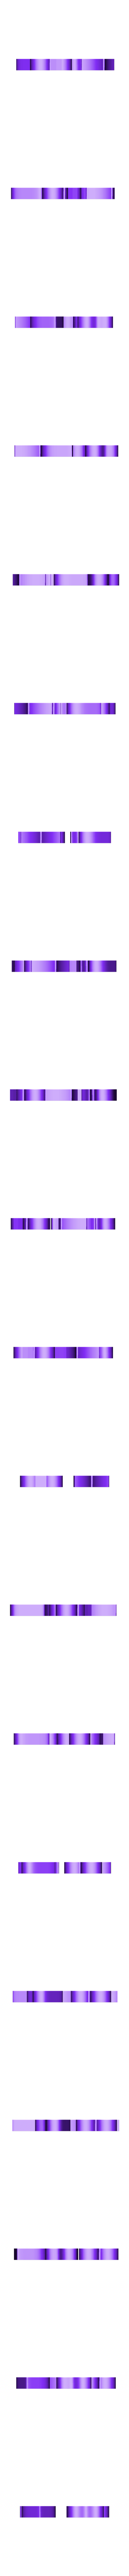 All.stl Download free STL file Cards Cookie Cutters (4 Pack) • 3D print design, Jdog